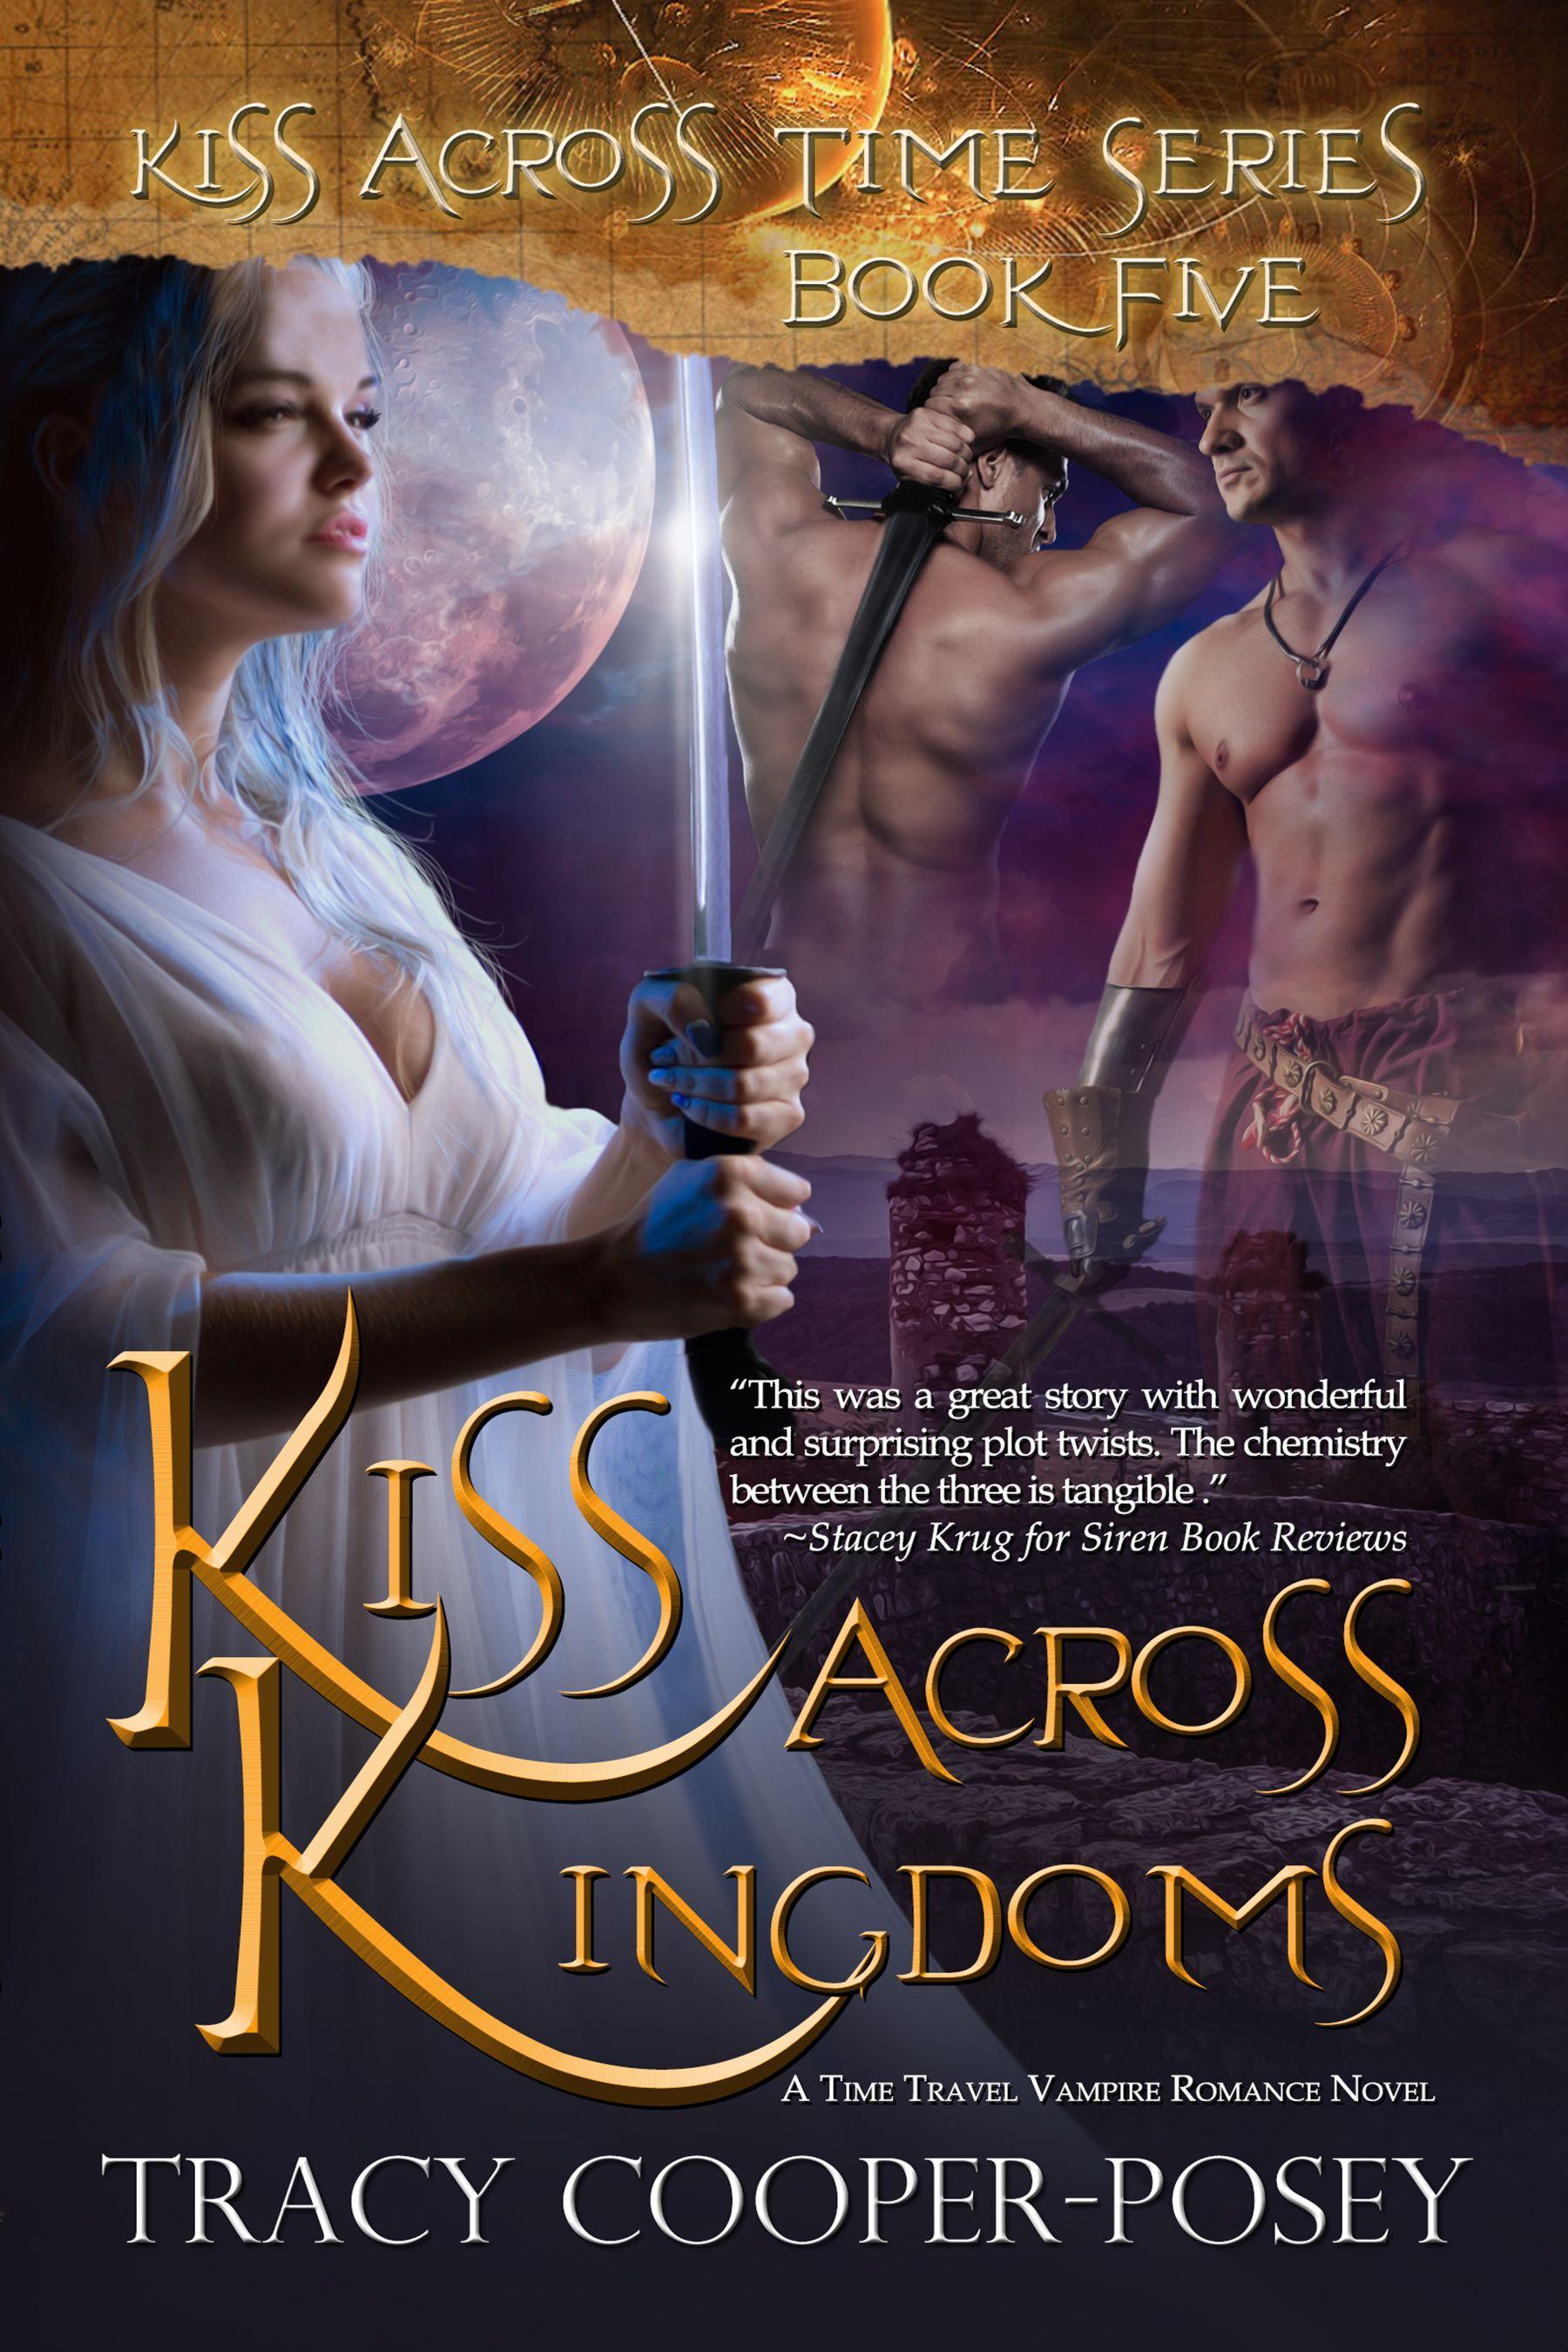 KISS ACROSS KINGDOMS Book 5 Kiss Across Time Series MMF Menage